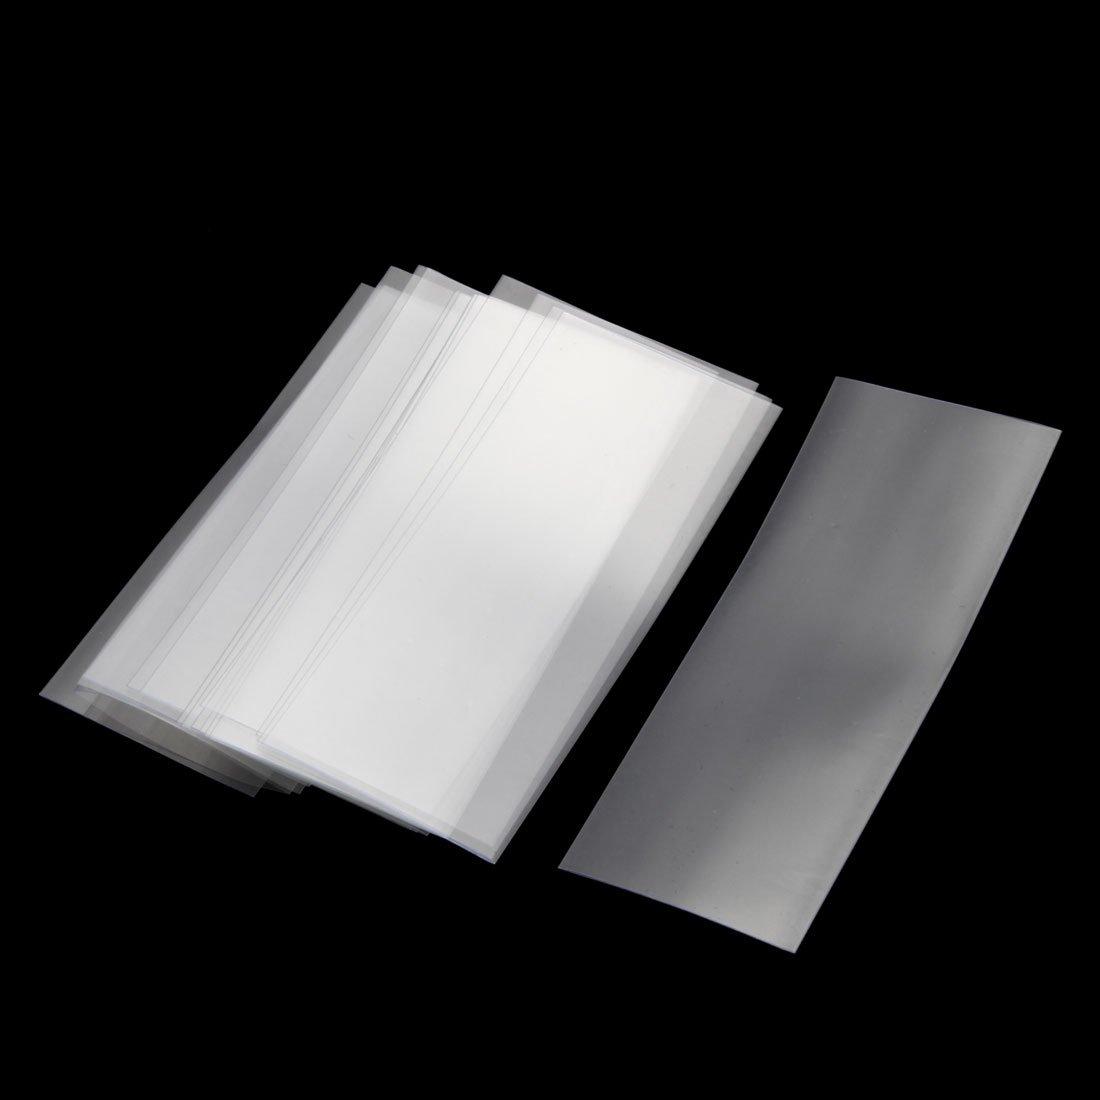 Black sourcingmap PVC Heat Shrink Tubing 29.5mm Flat Width Pre Cut Heat Shrink Wrap Tube for 18650 72mm Length Pack of 20